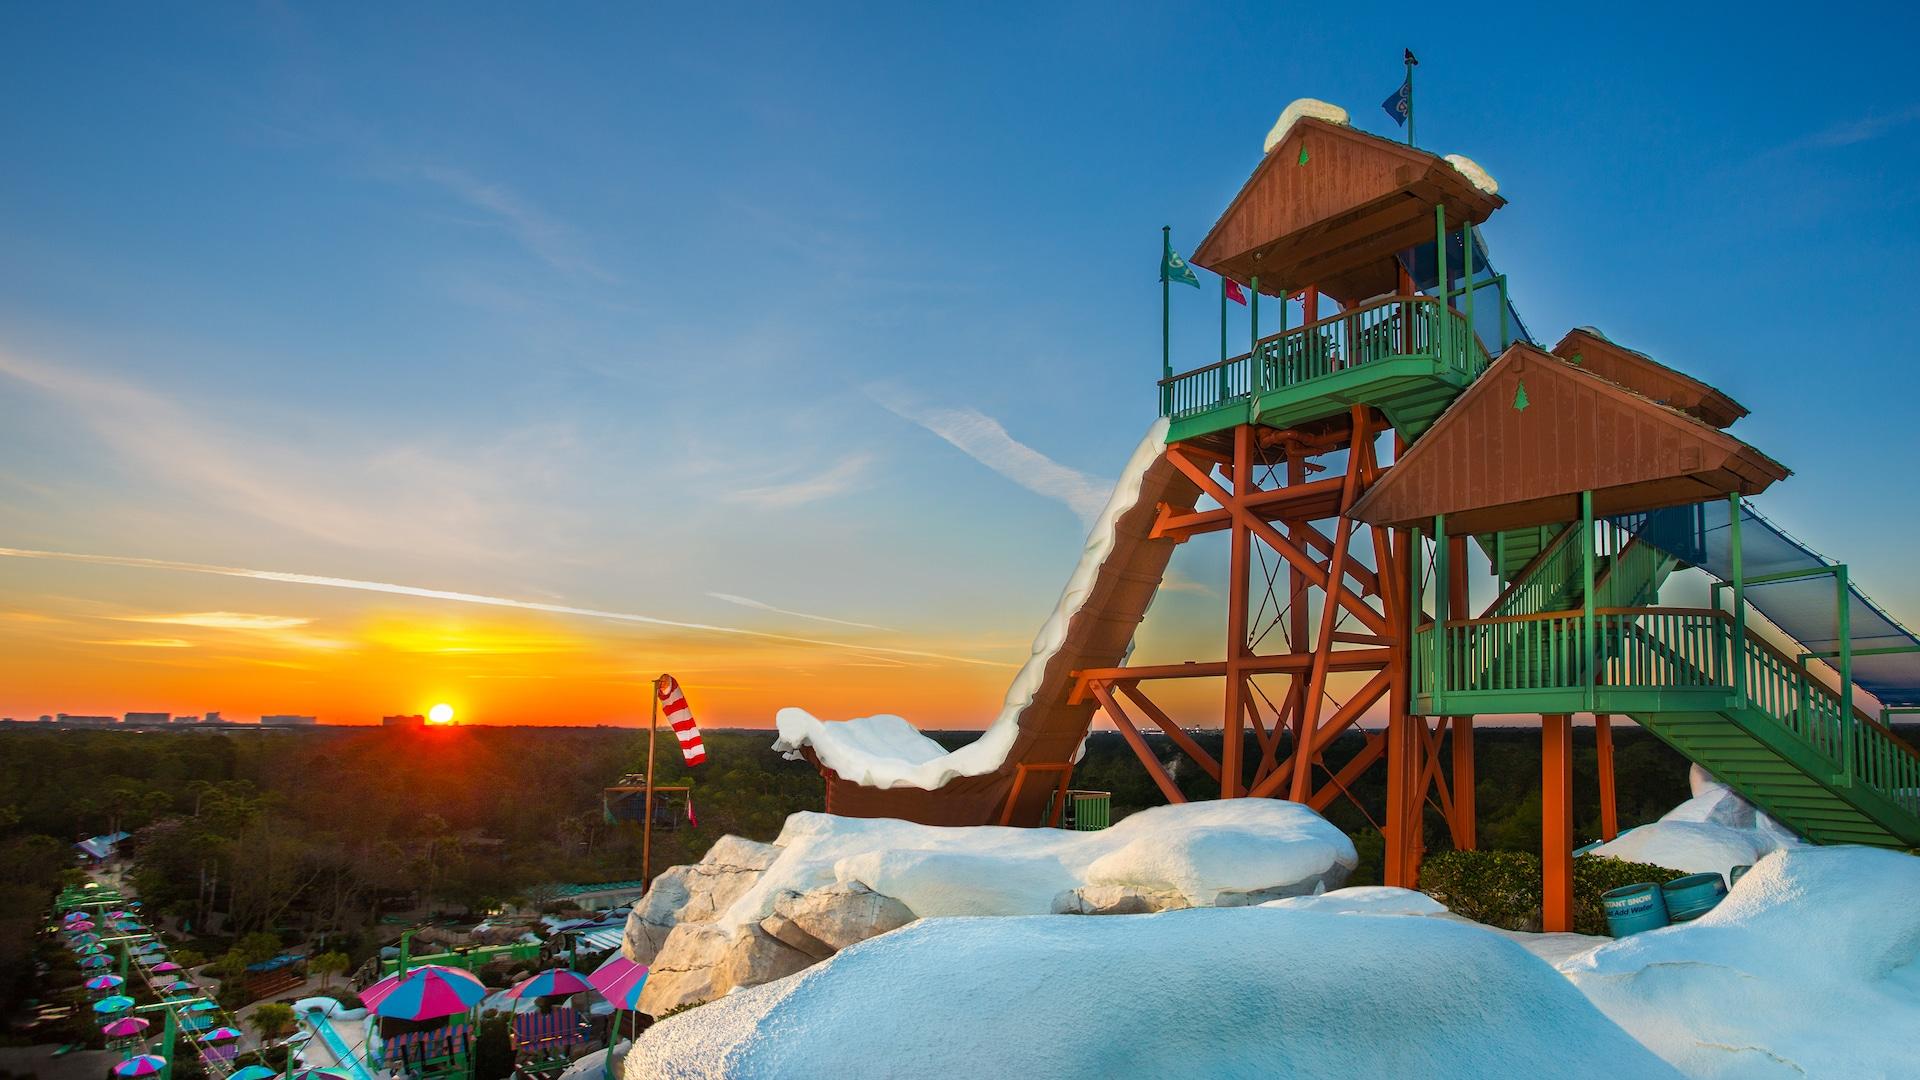 Summit Plummet Blizzard Beach